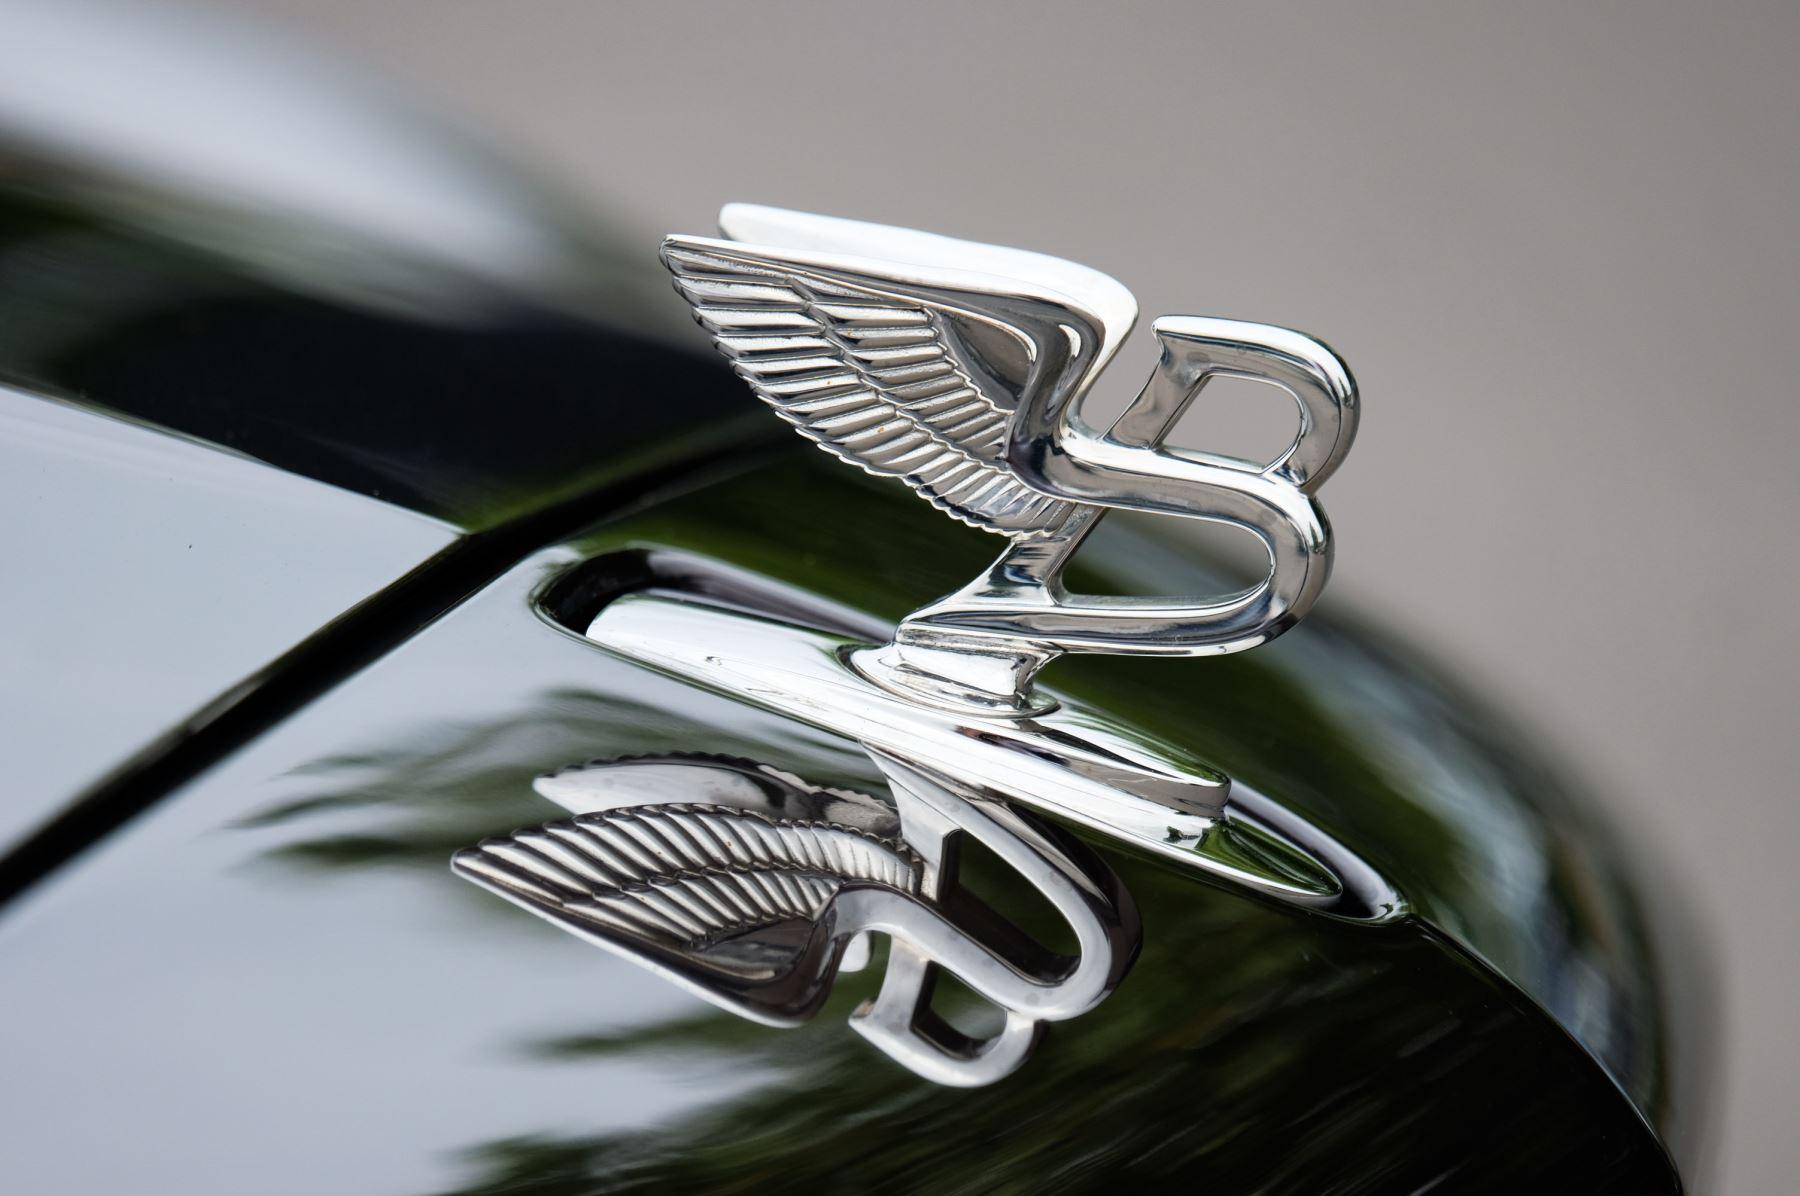 Bentley Mulsanne 6.8 V8 Speed - Speed Premier Specification image 7